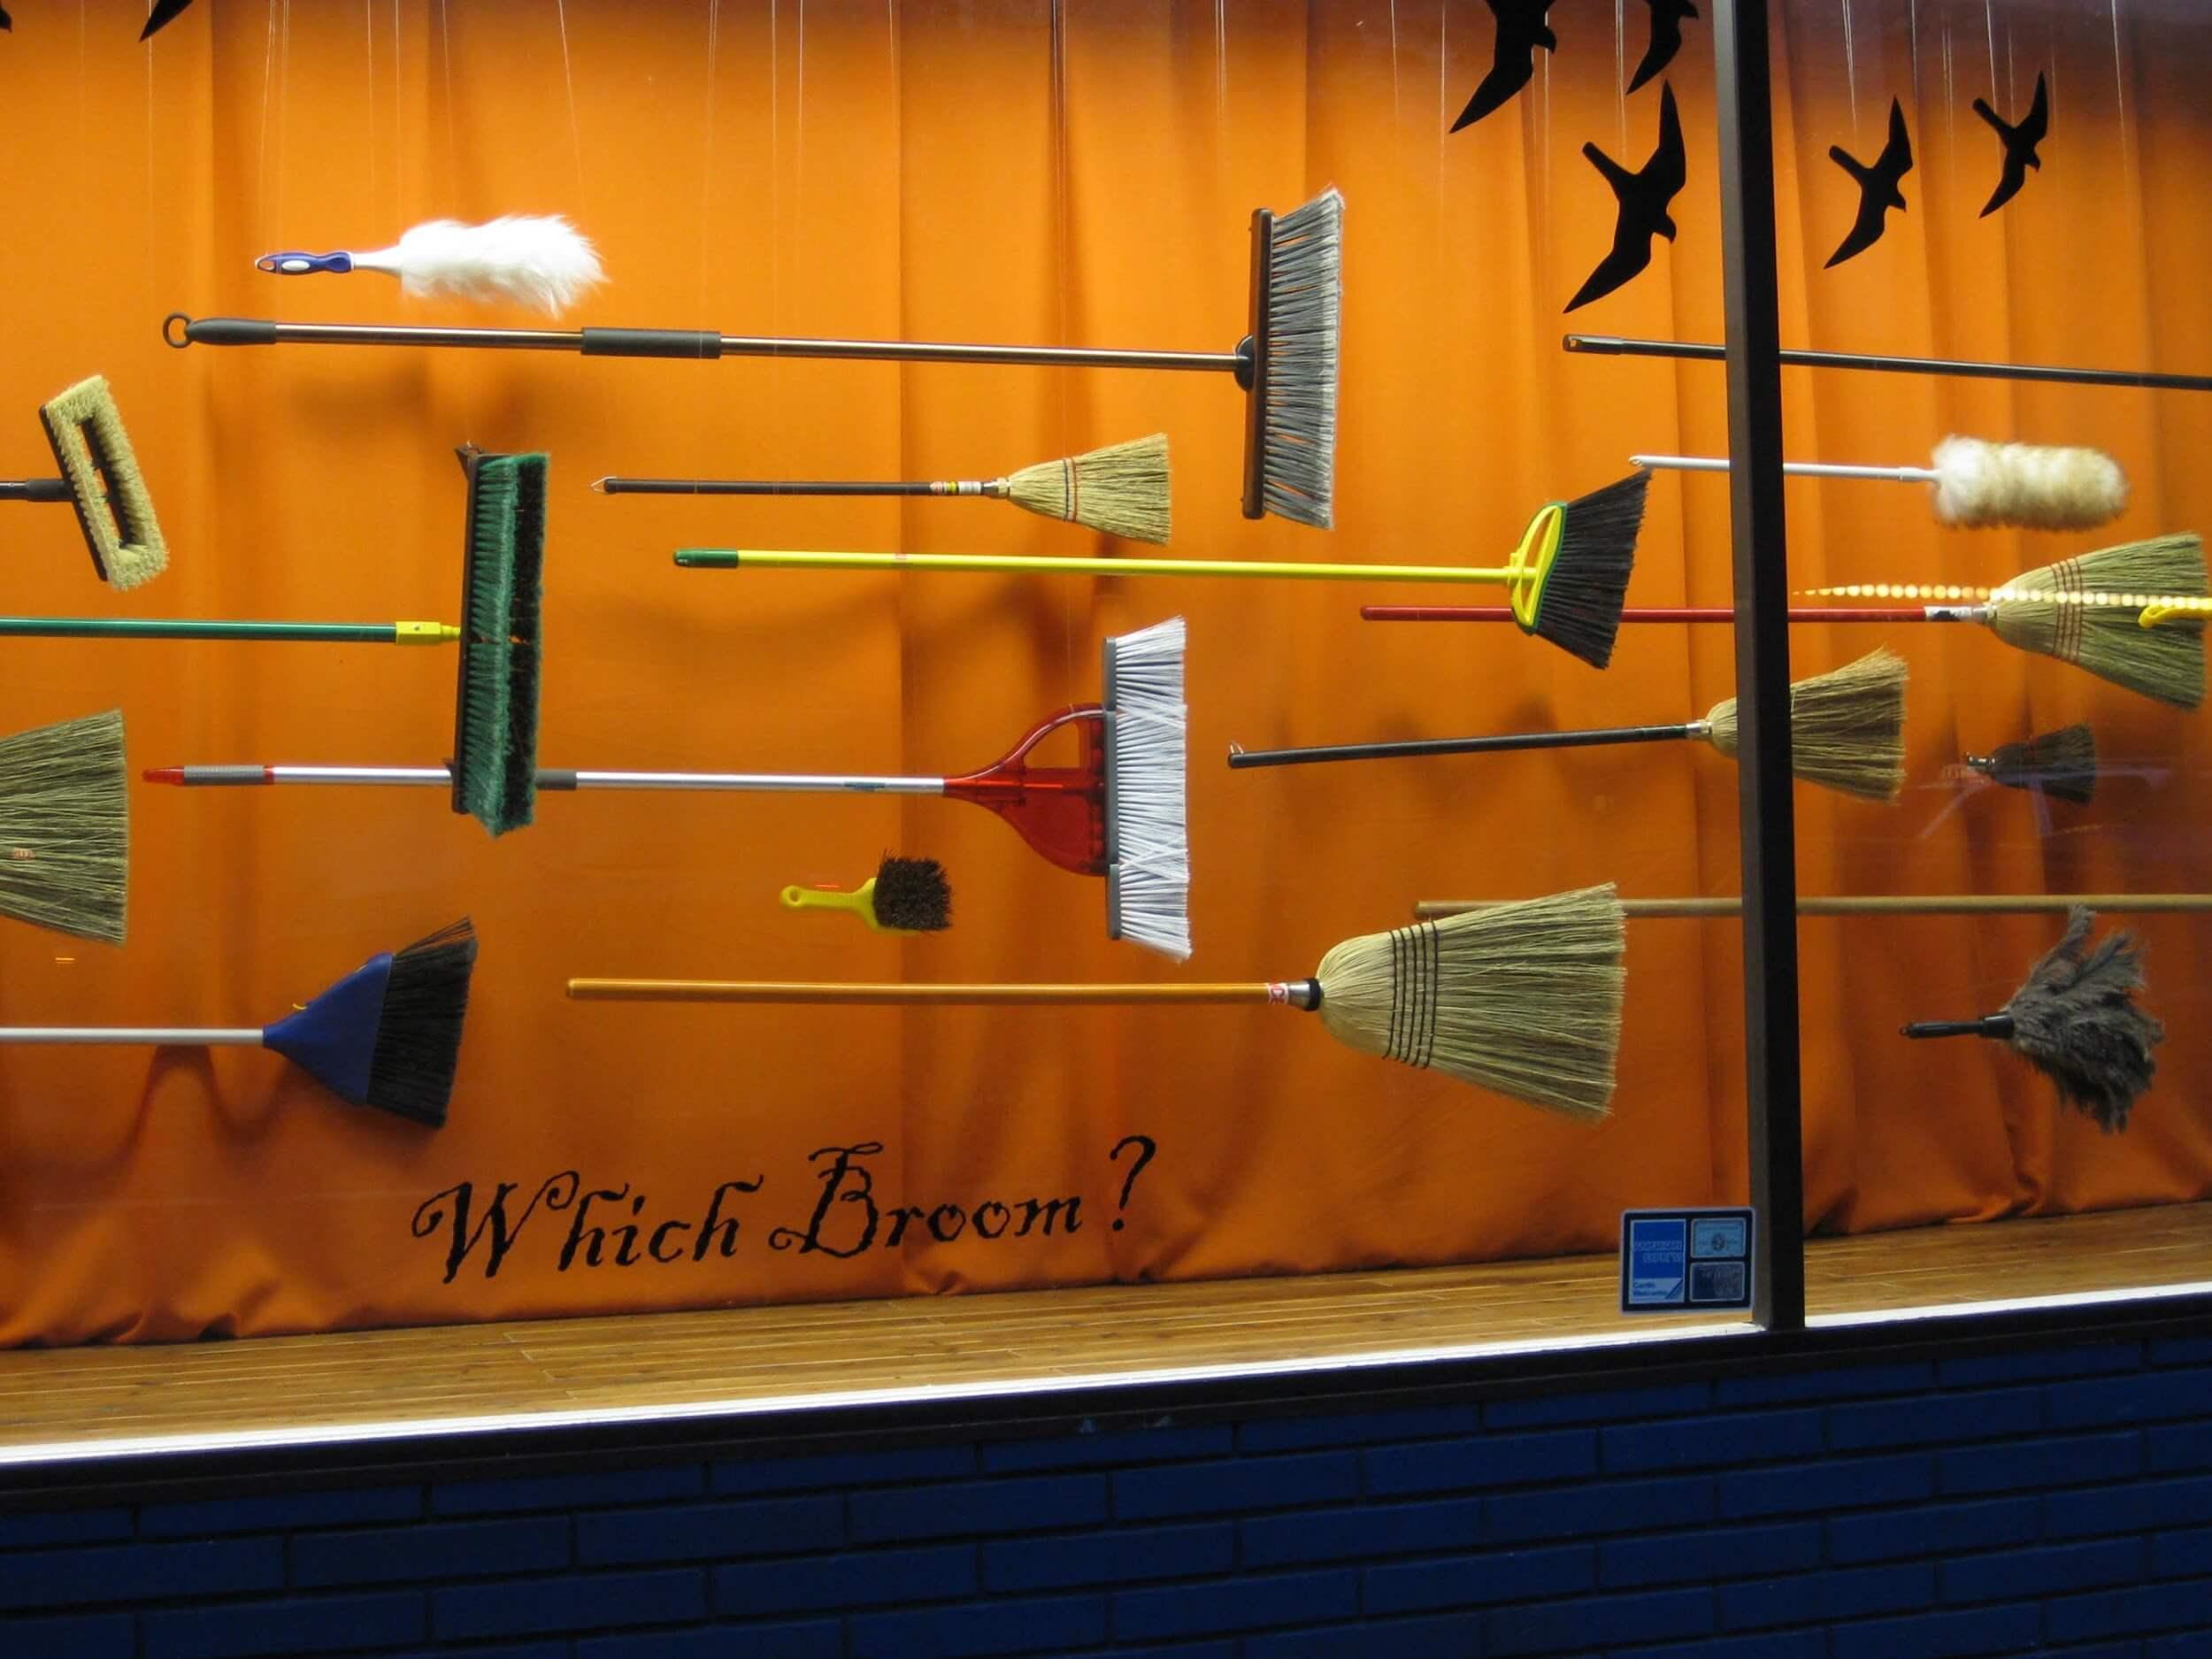 Halloween Shop Displays.10 Top Tips For Great Shop Window Displays This Autumn Minutehack